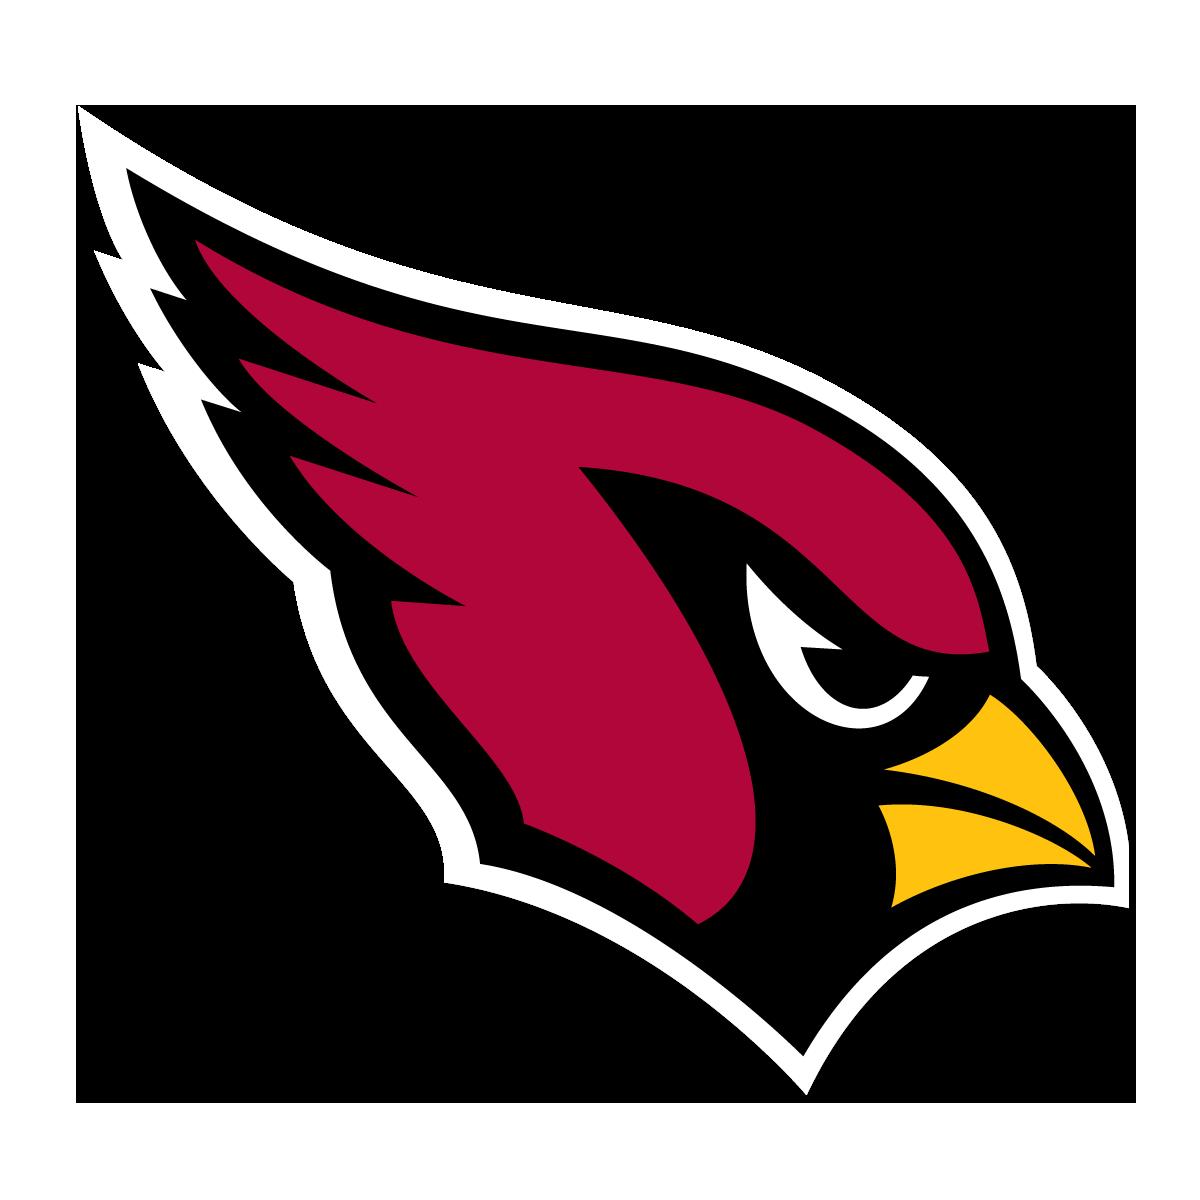 Cardinals baseball cap clipart svg freeuse library Cheerleader of the Week - Heidi | Pinterest | Cardinals, Arizona ... svg freeuse library